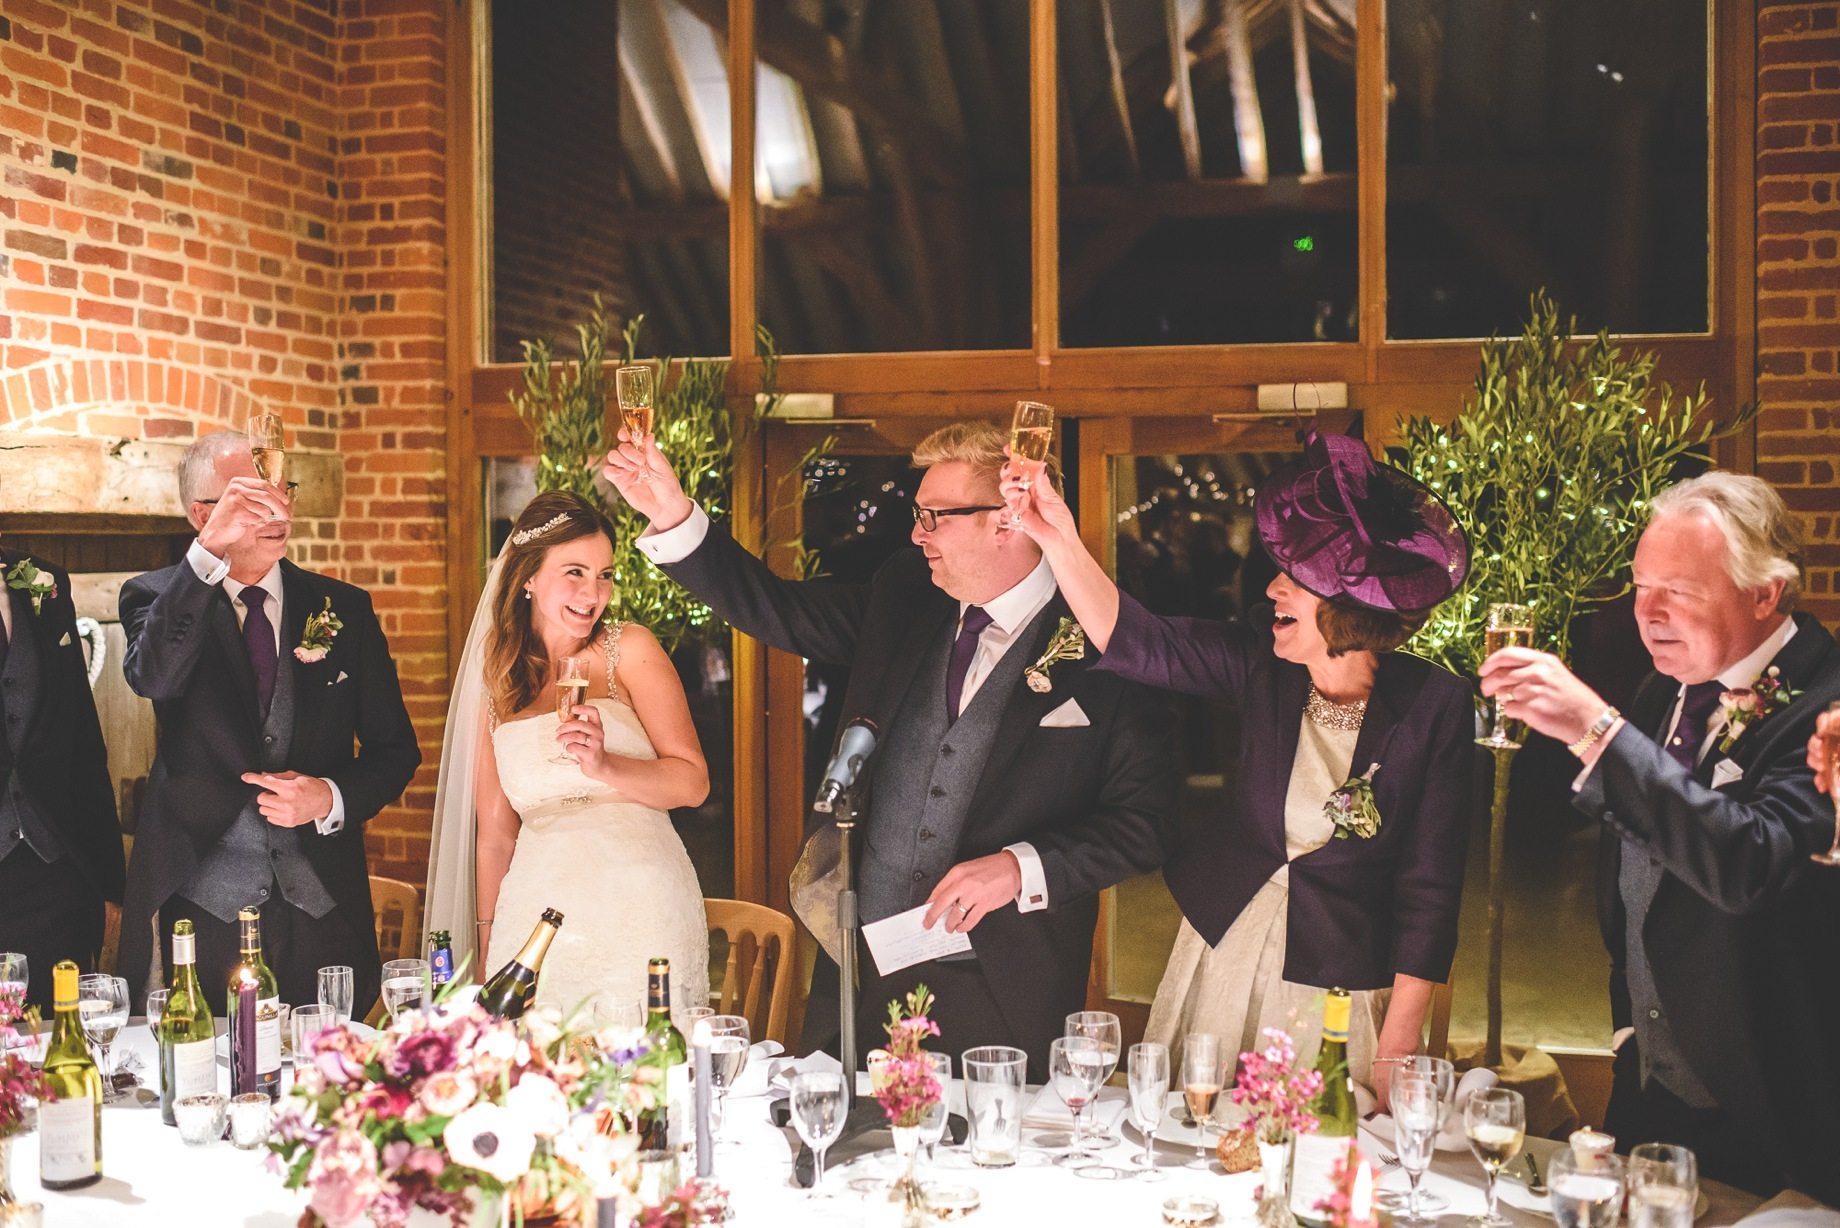 Heather and Chris - Hampshire wedding photography (154 of 174)